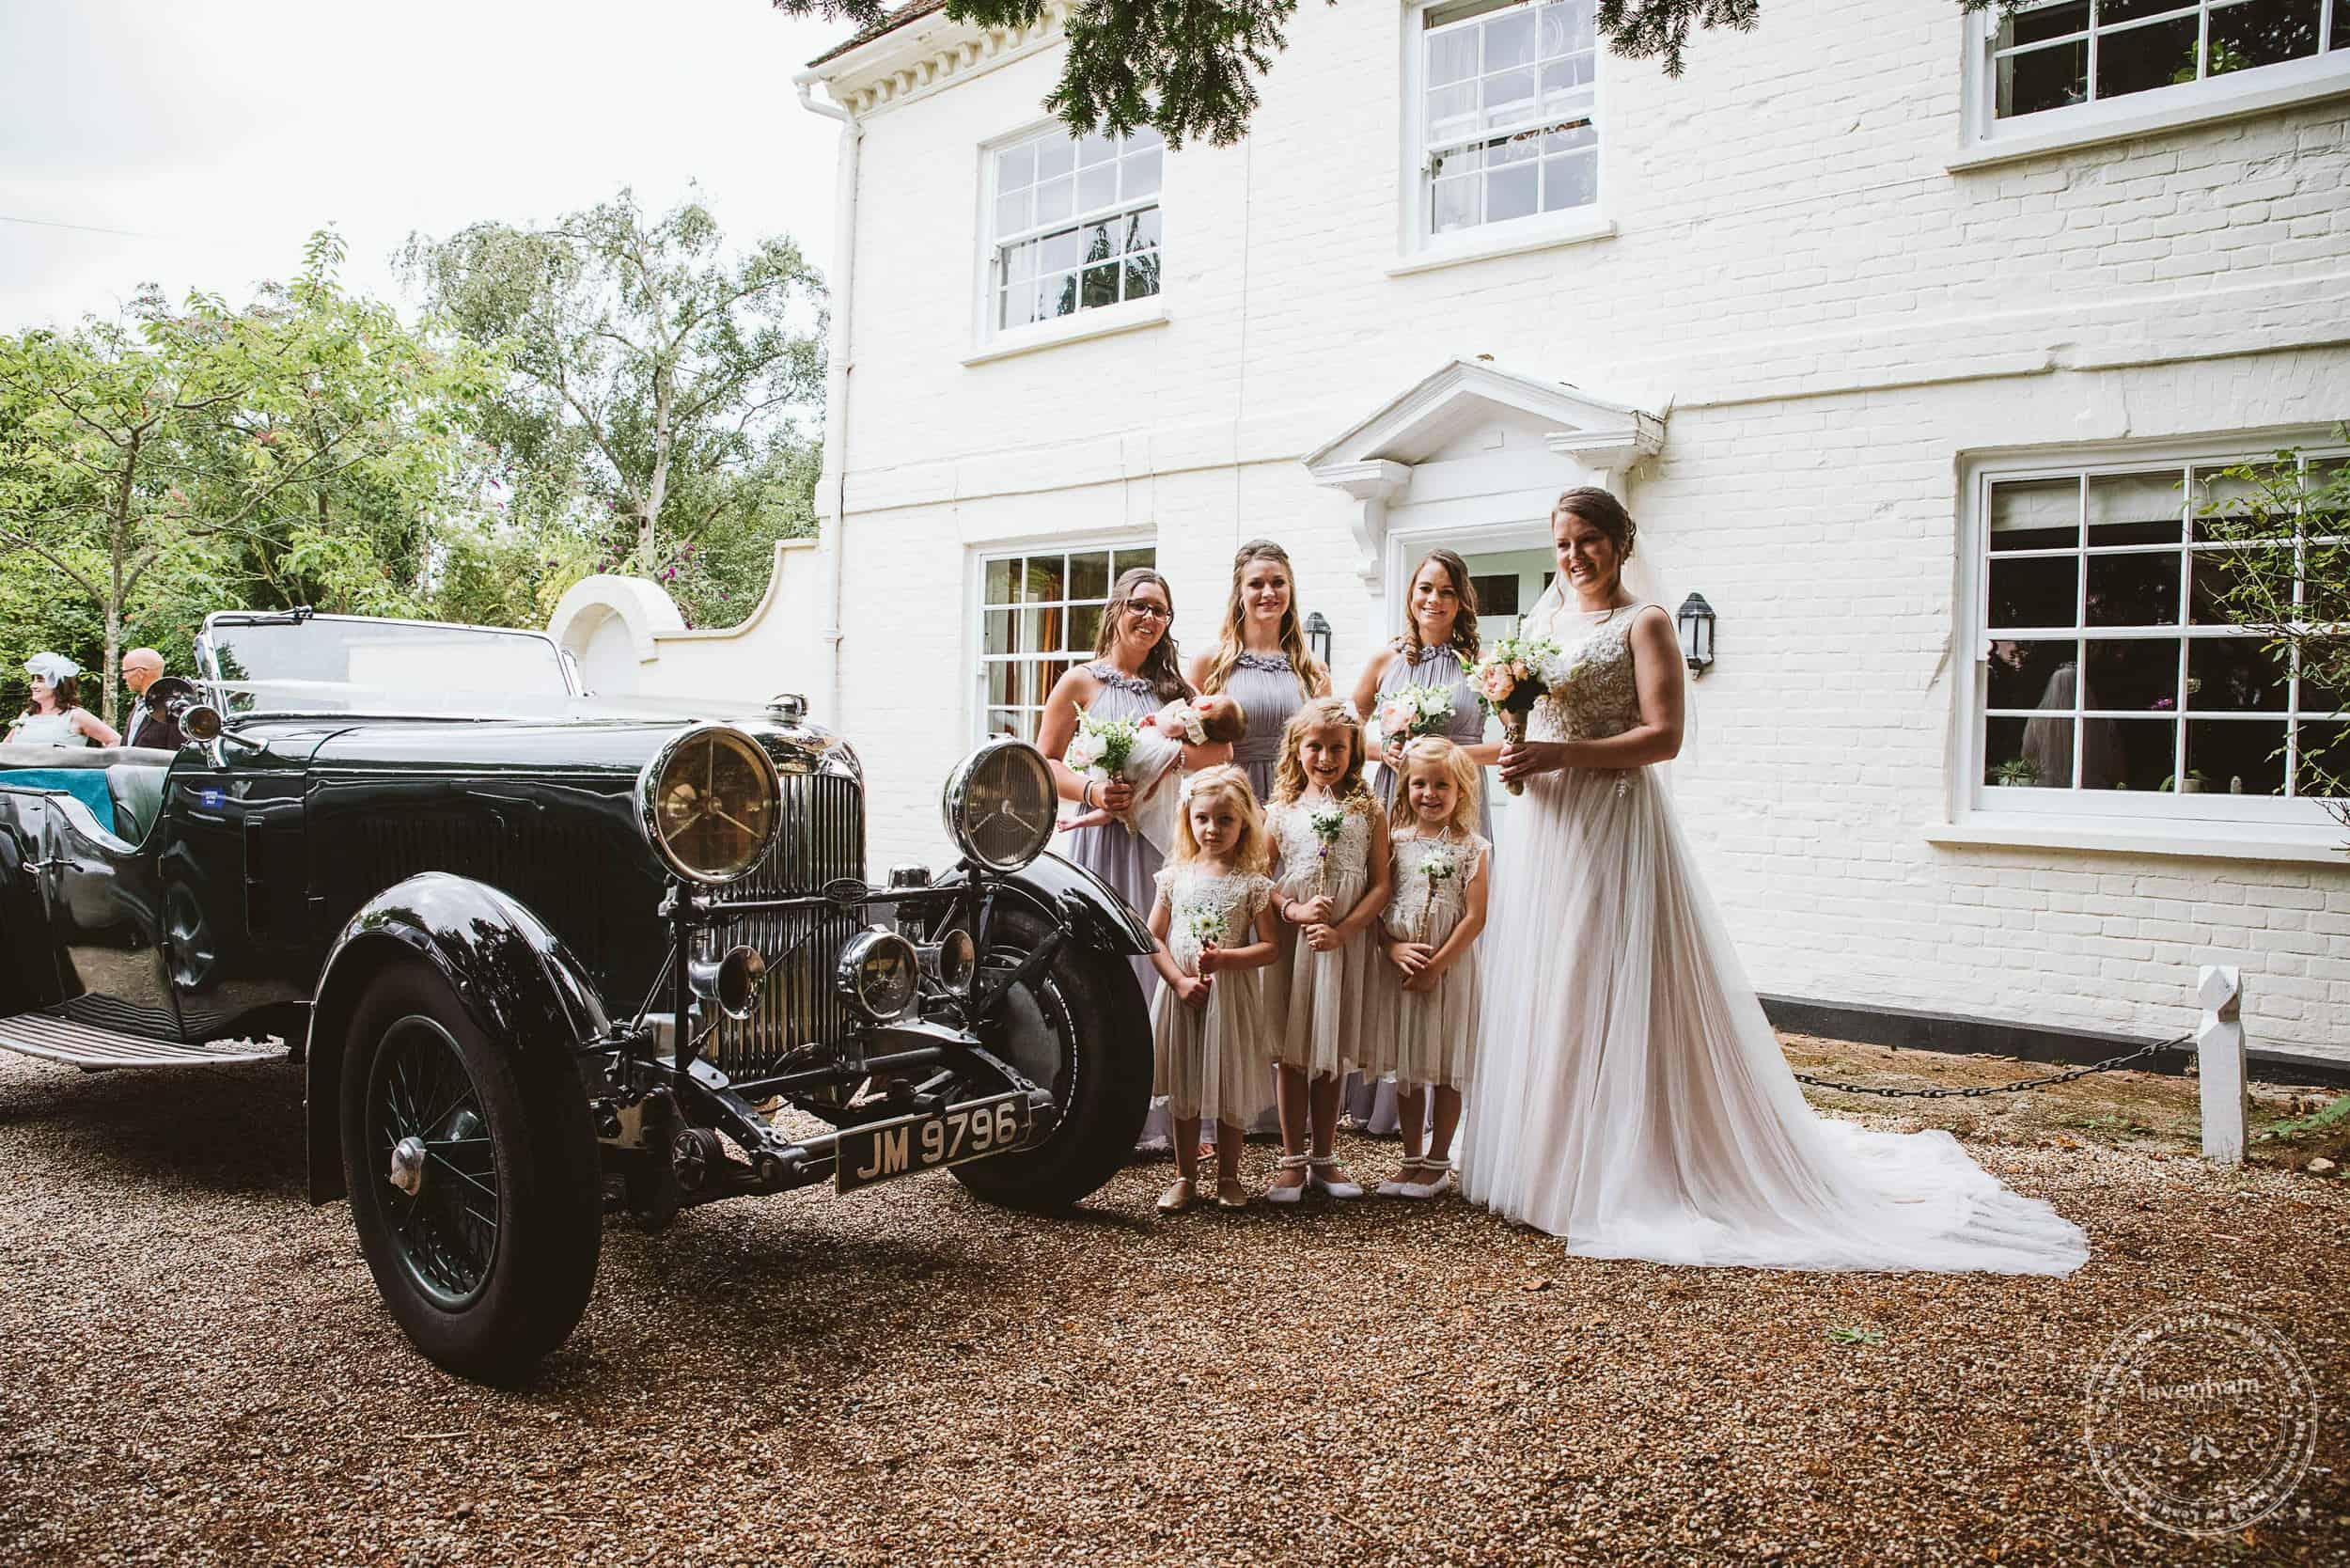 180818 Marks Hall Wedding Photography Lavenham Photographic 038